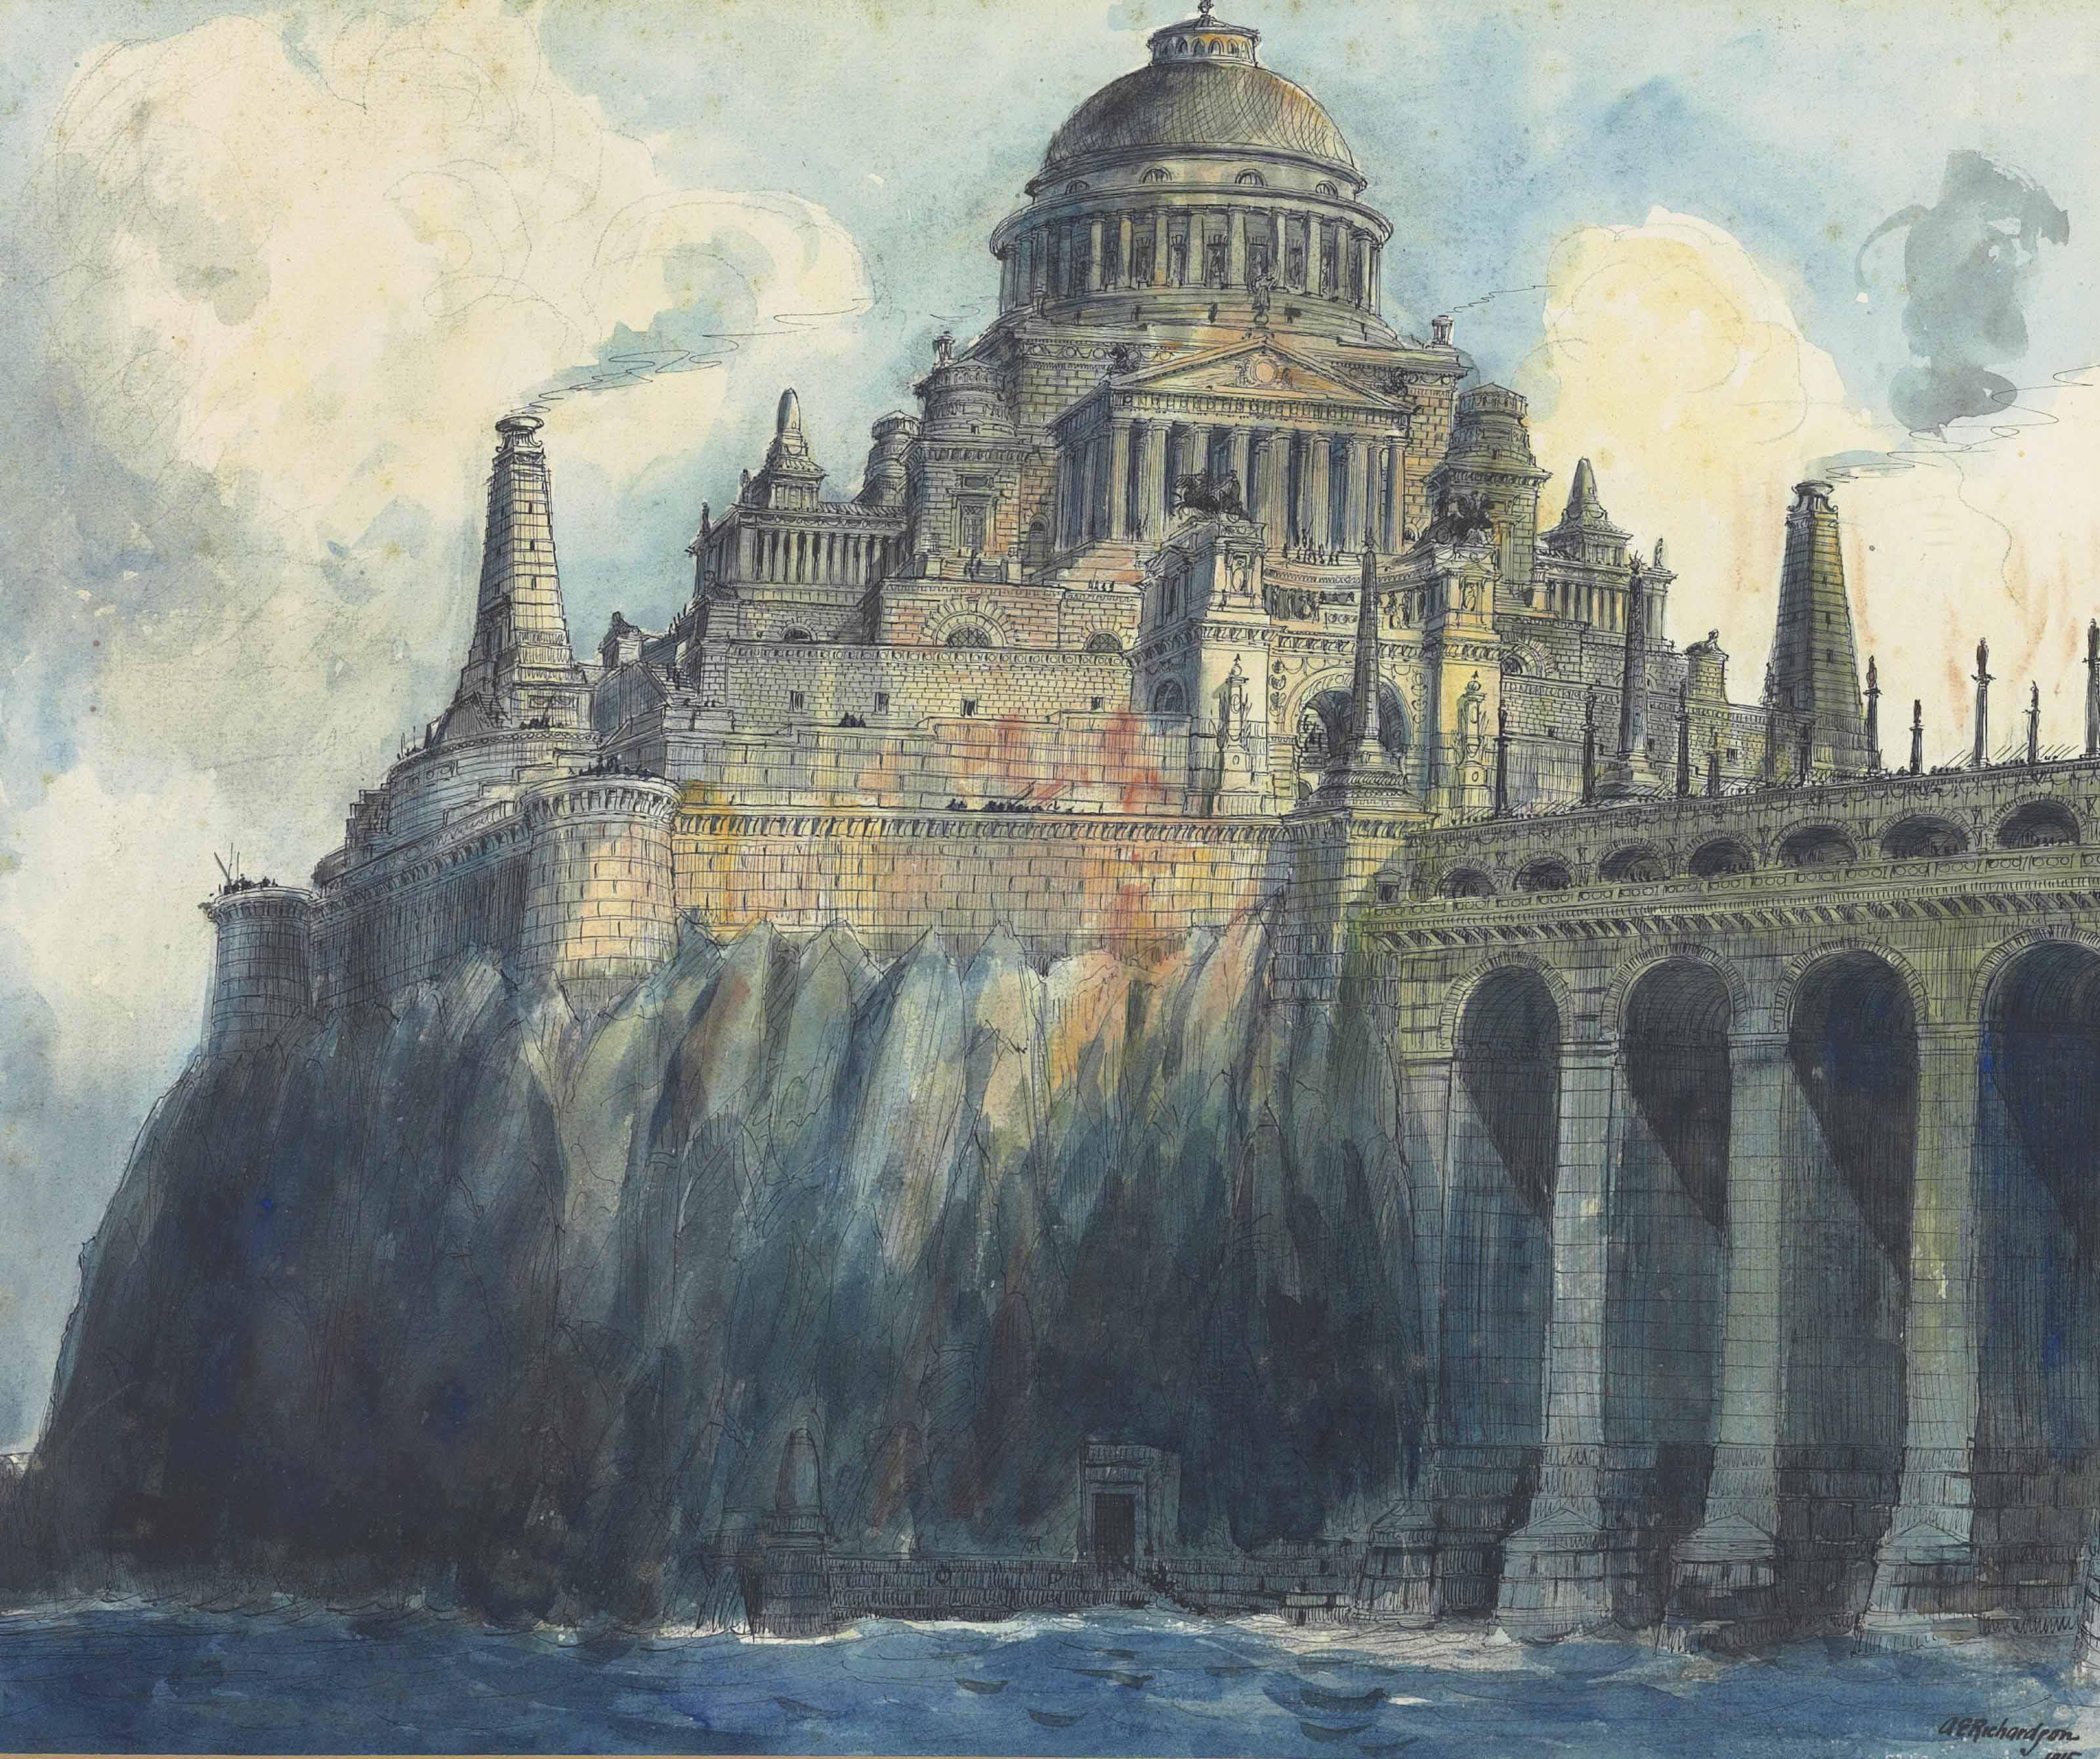 A Fantasy of Kubla Khan's Palace